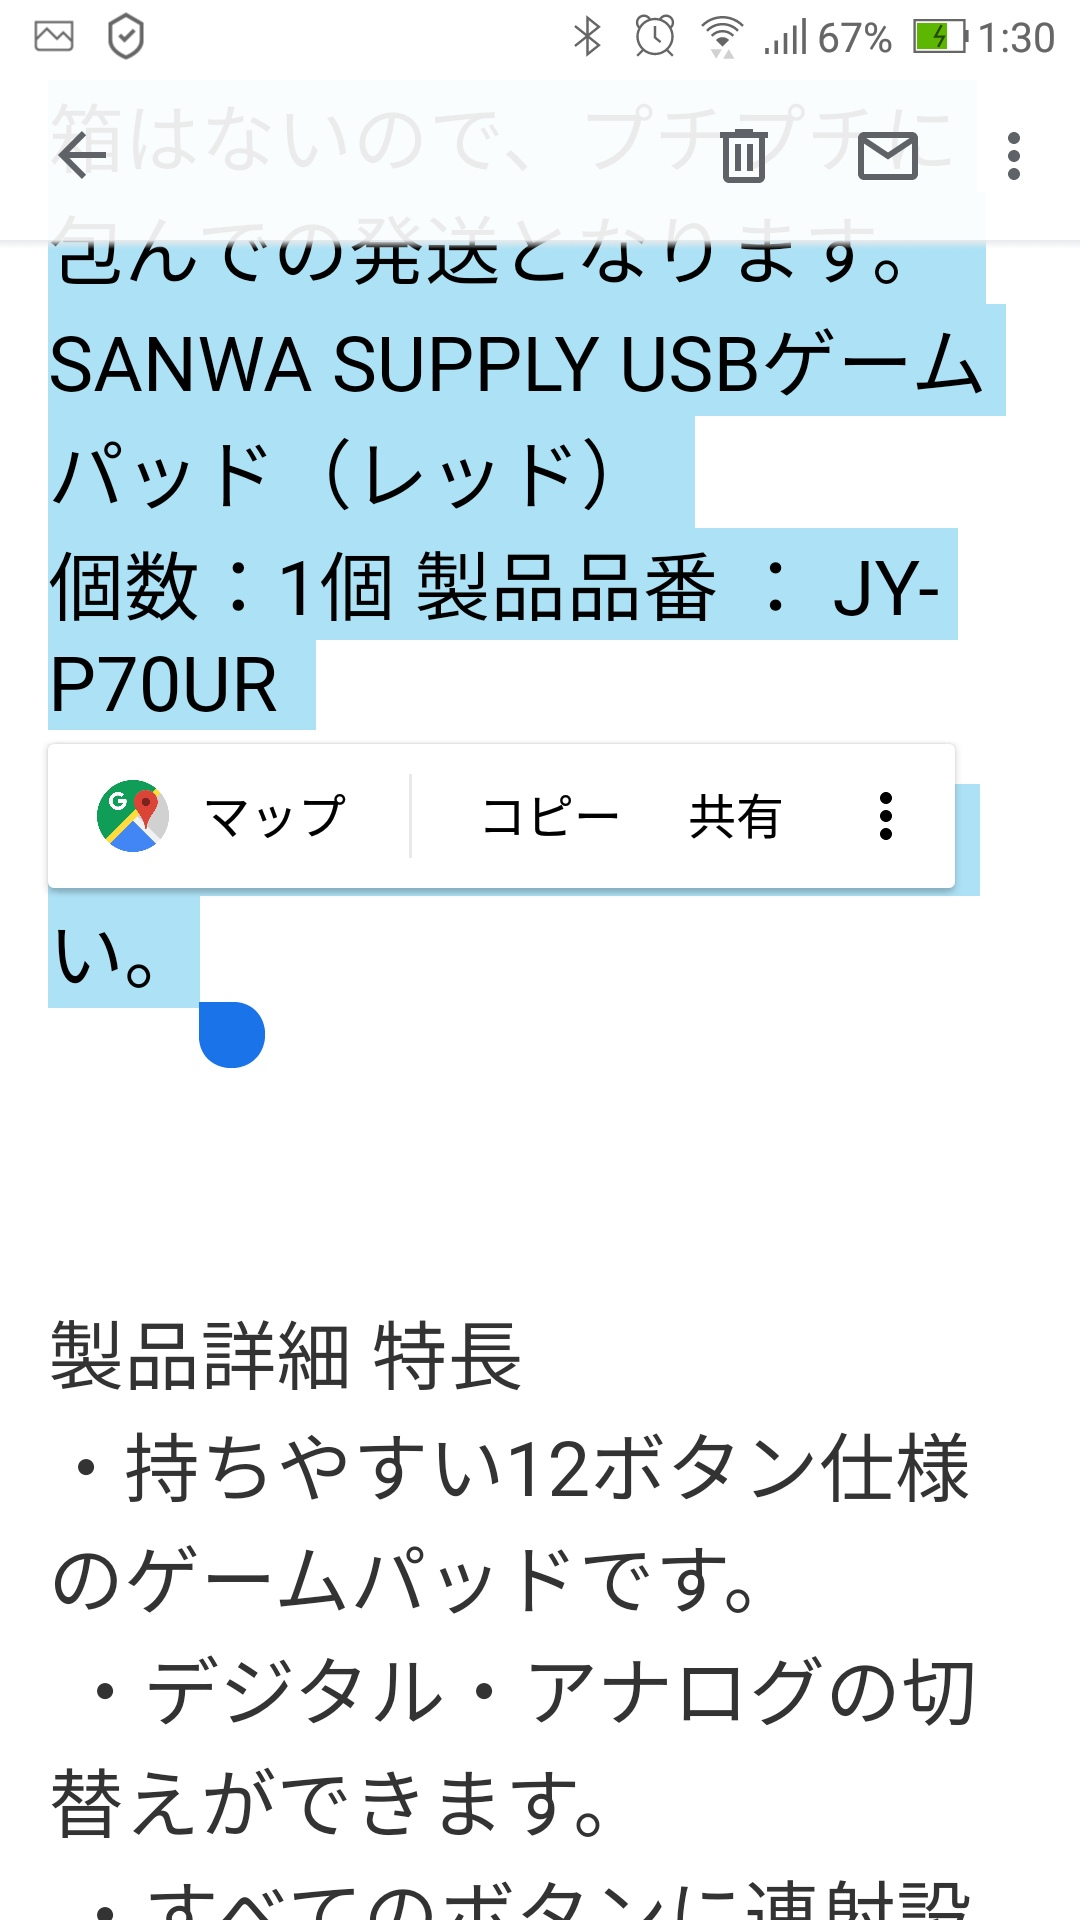 Screenshot 20191102 013028 - メルカリからPayapyフリマへ出品切り替えと比較~最短手順・画像付き